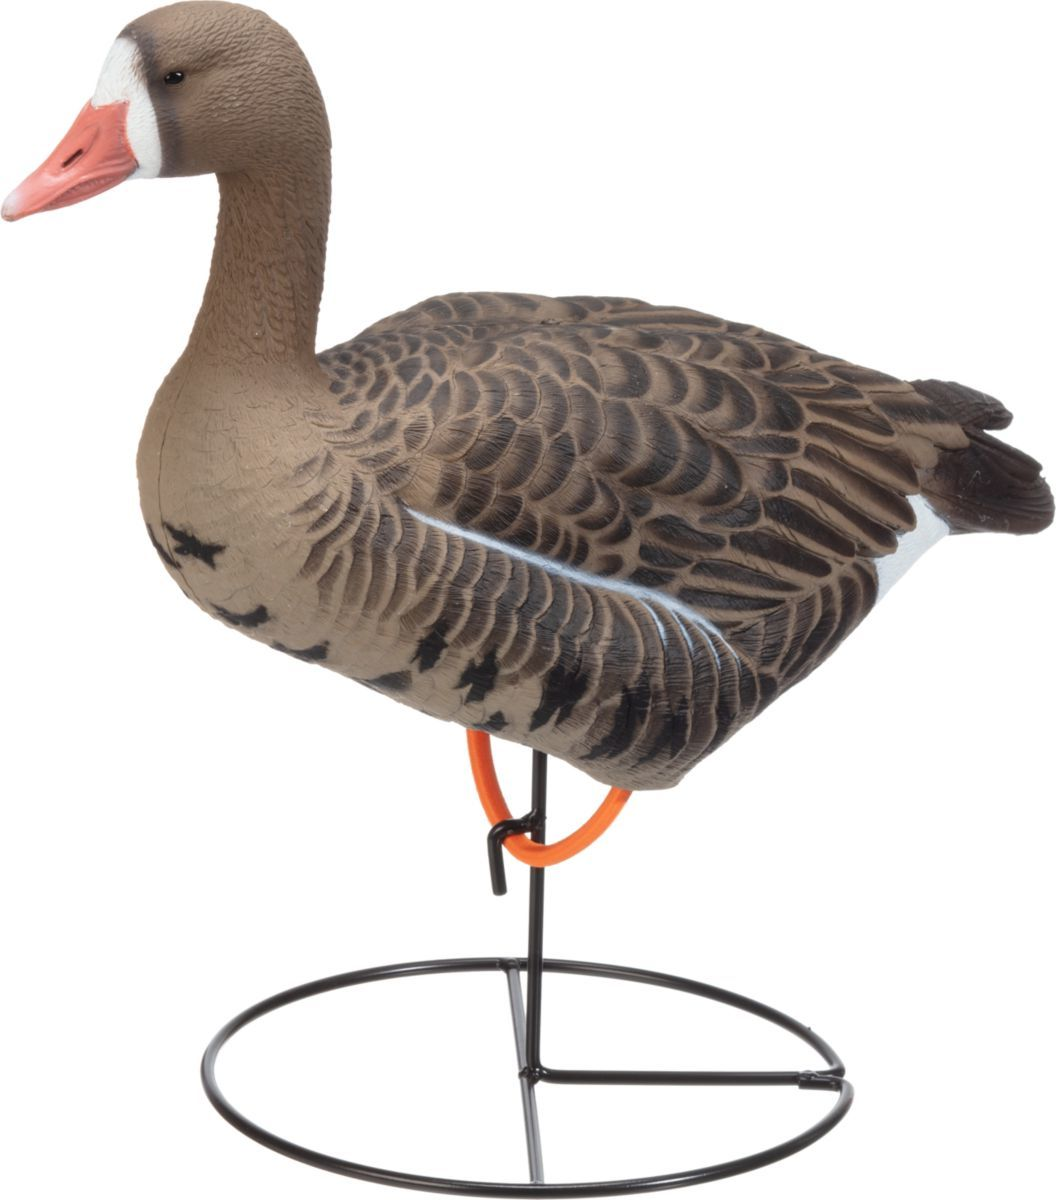 Dakota Decoy White-Fronted Full-Body Goose Decoys